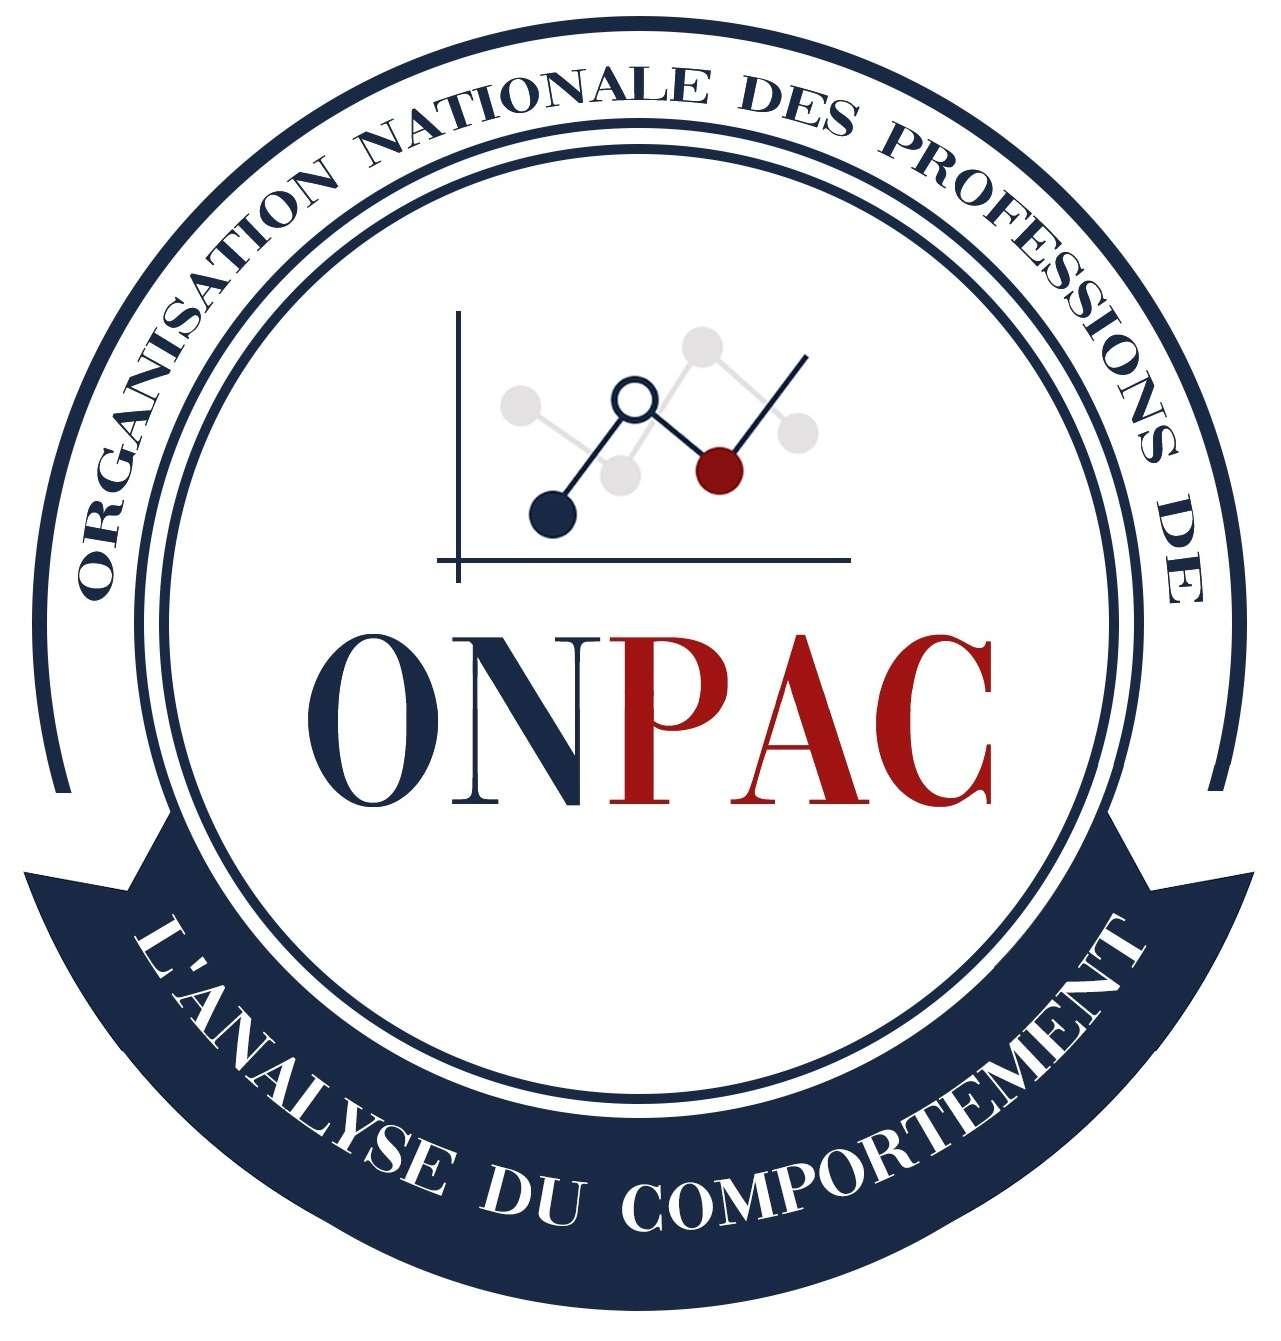 ONPAC